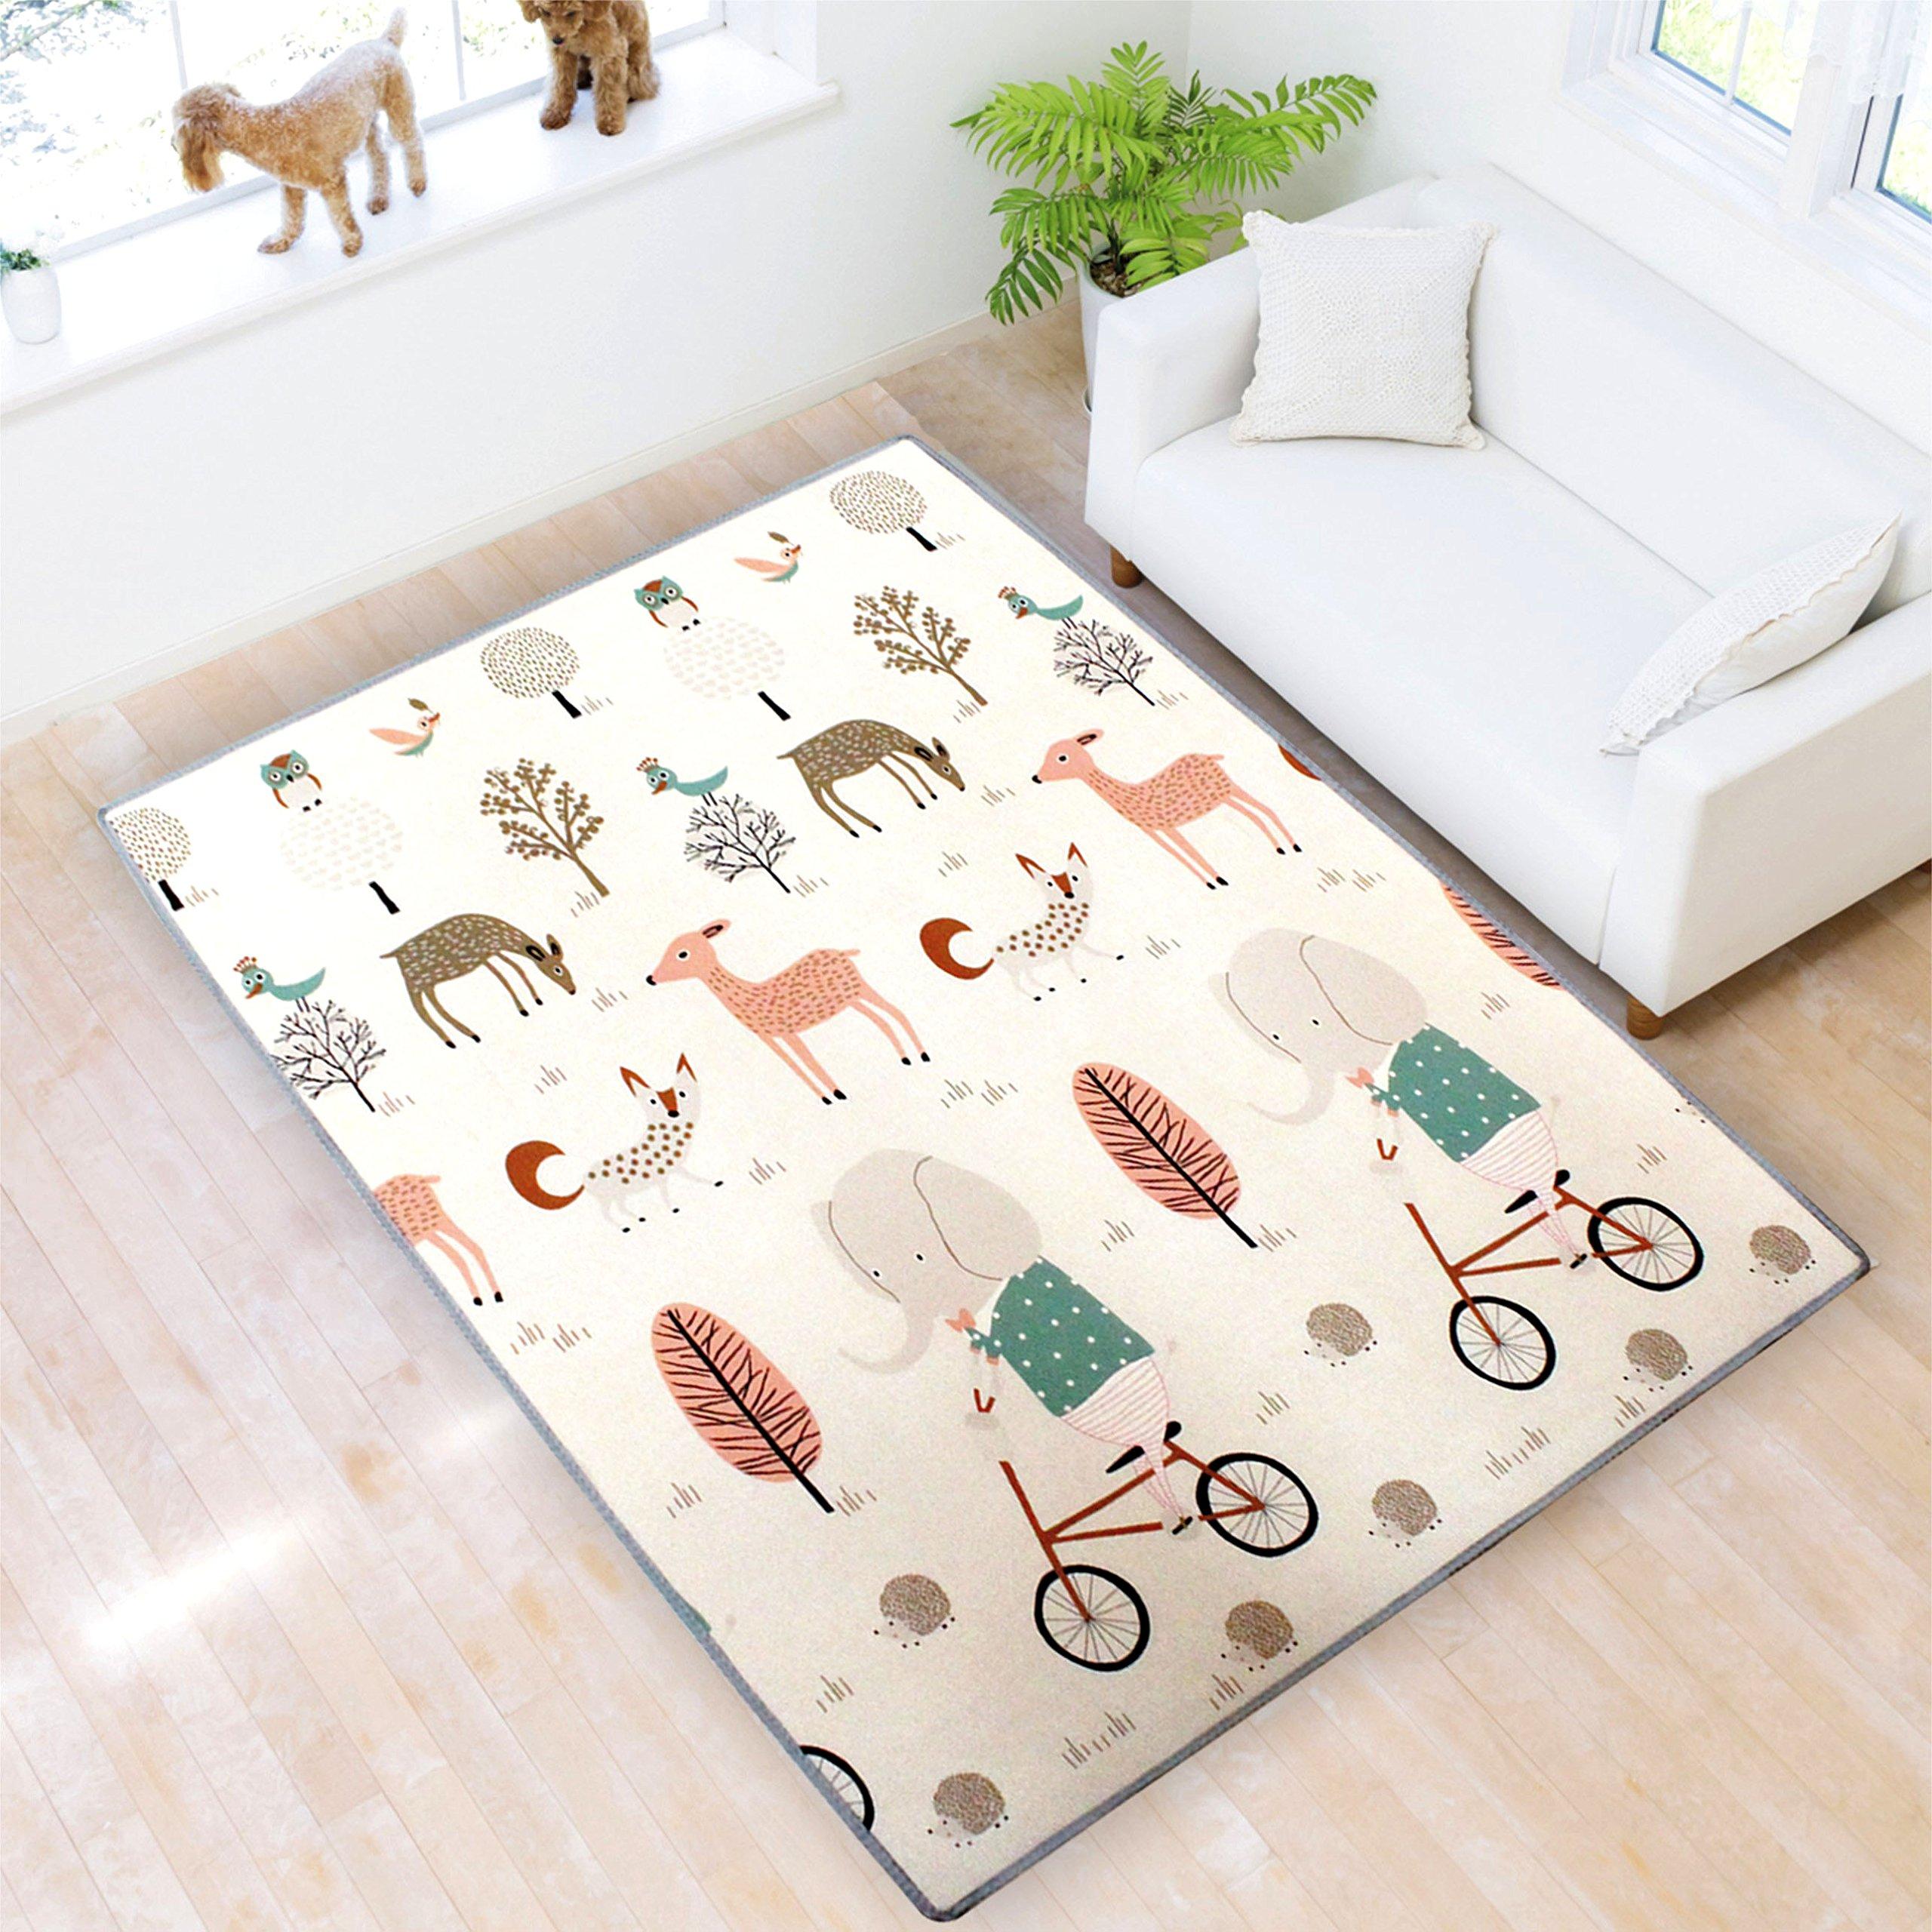 caterpillar carle eva non baby for babies play toxic infant foam tiles eric mats hungry girl mat boy floor interlocking pin